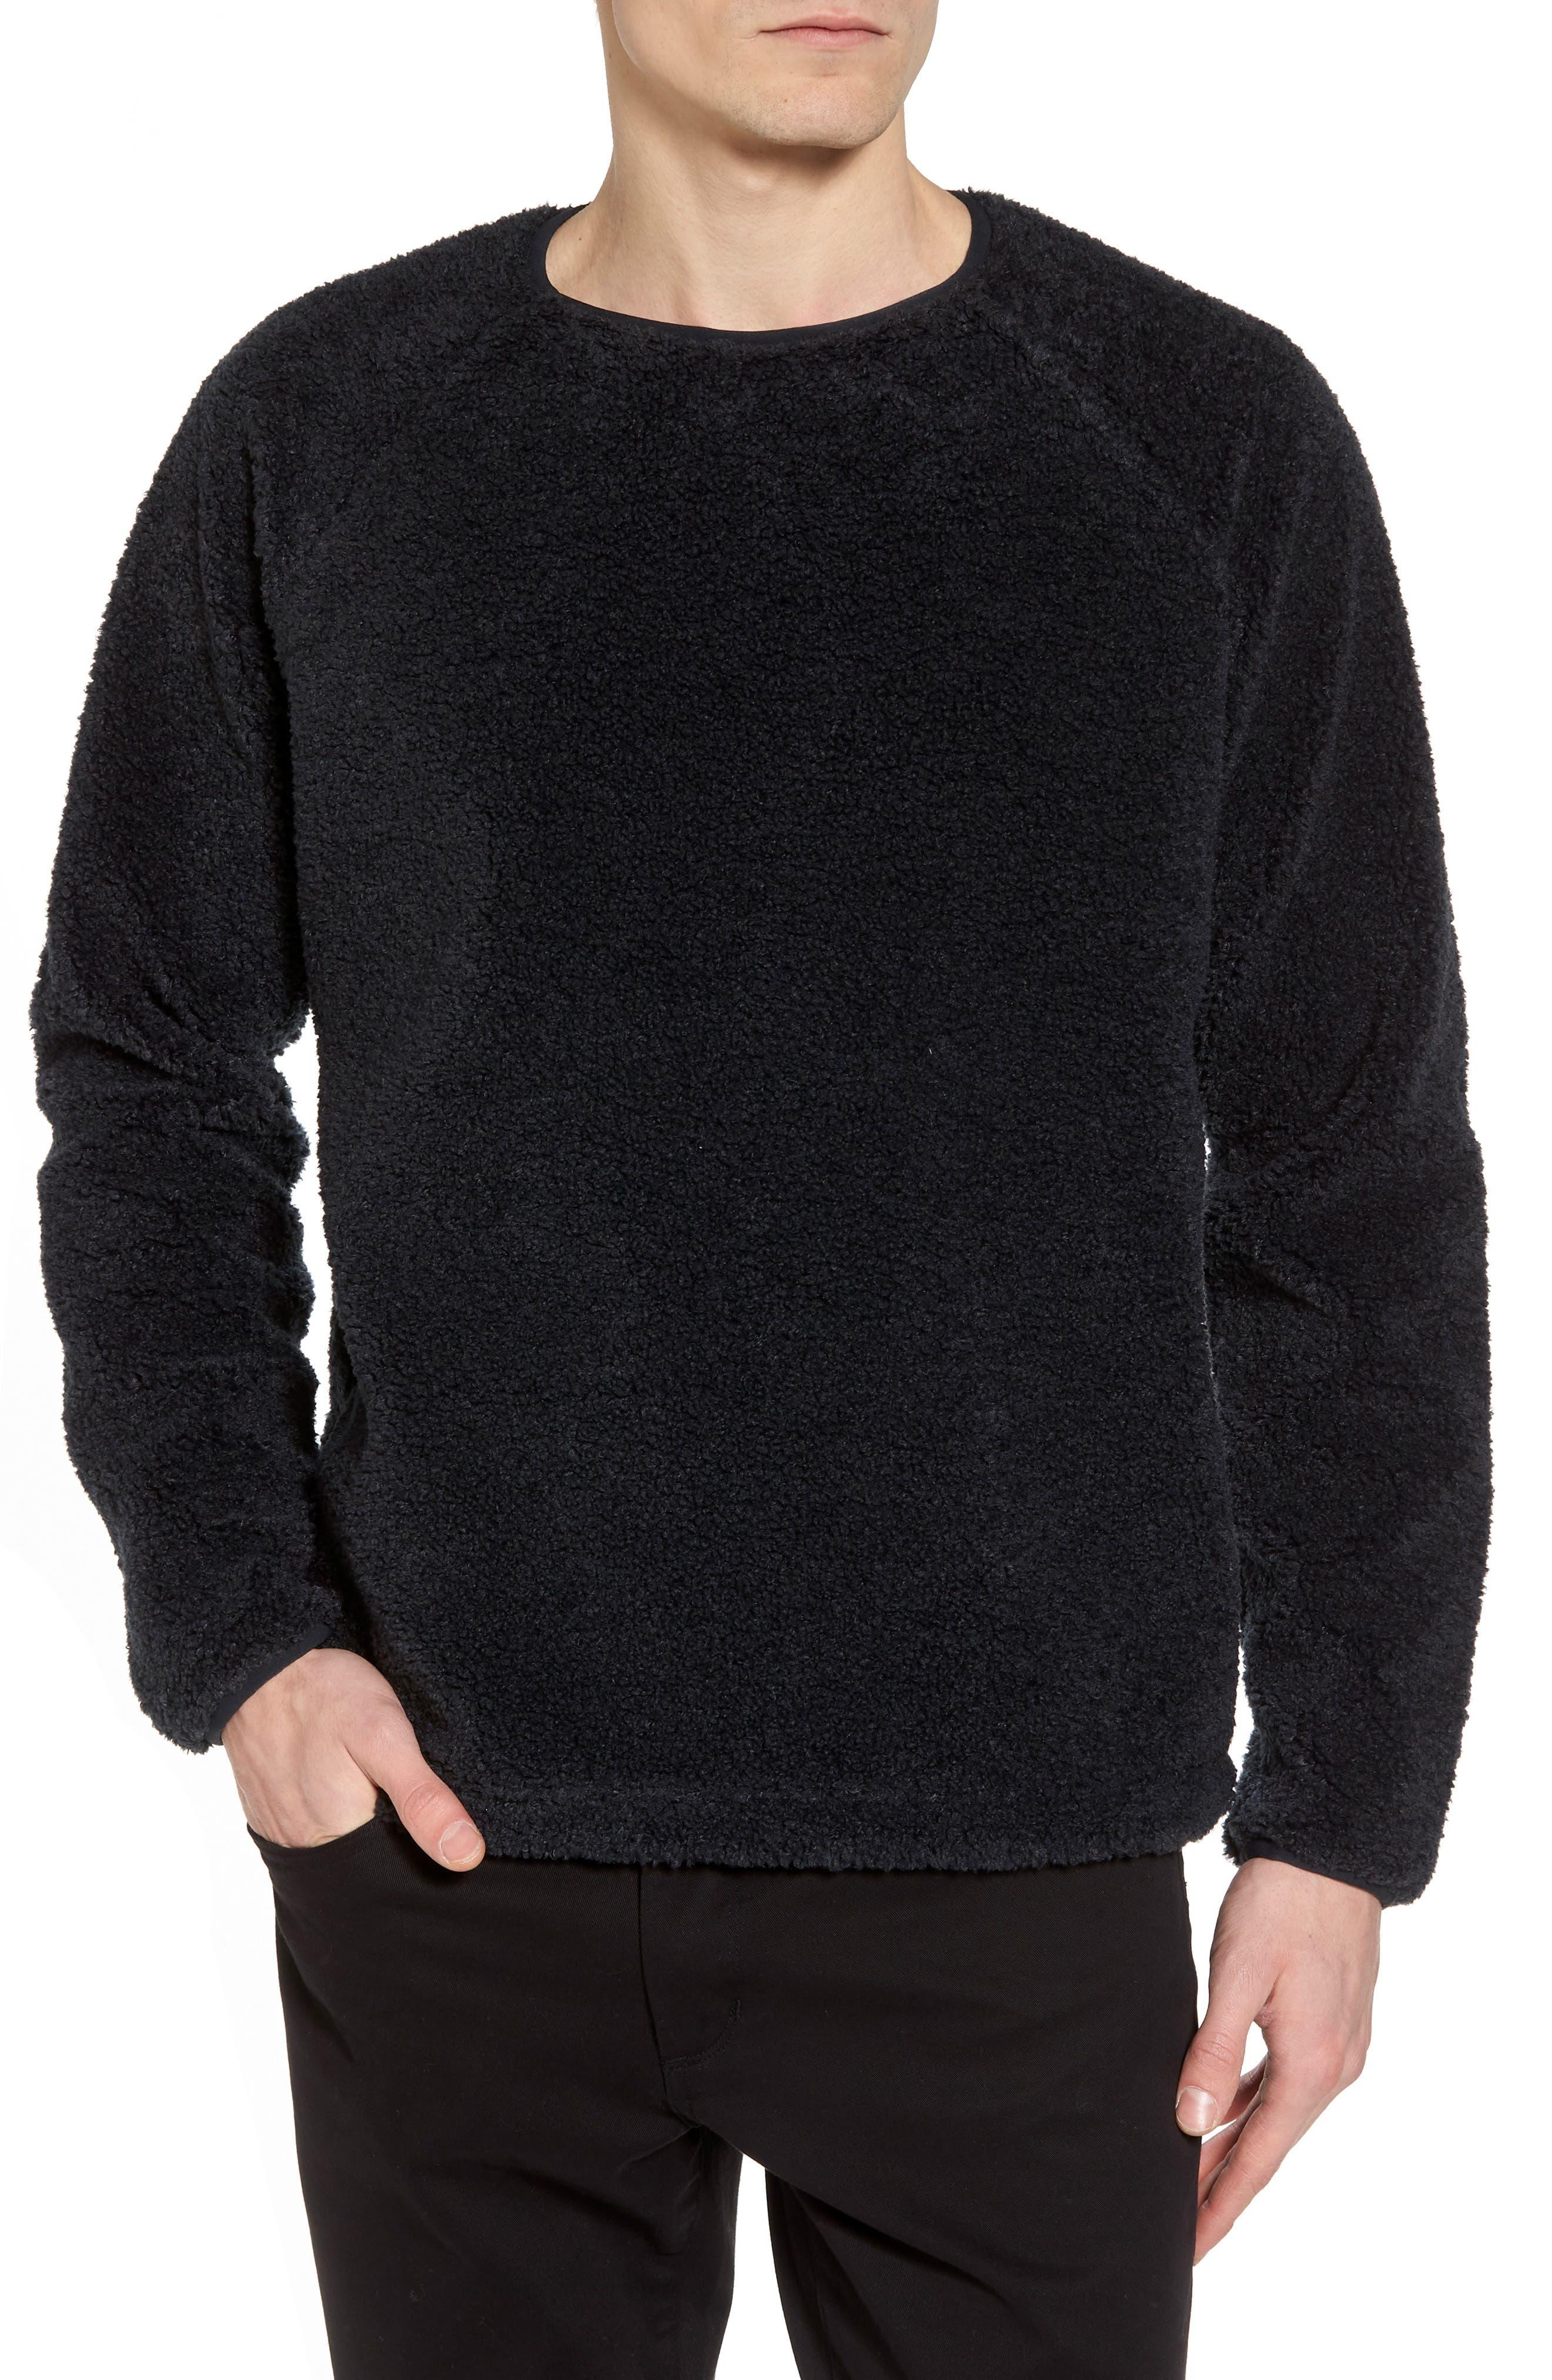 Alternate Image 1 Selected - YMC Deliverance Fleece Sweatshirt